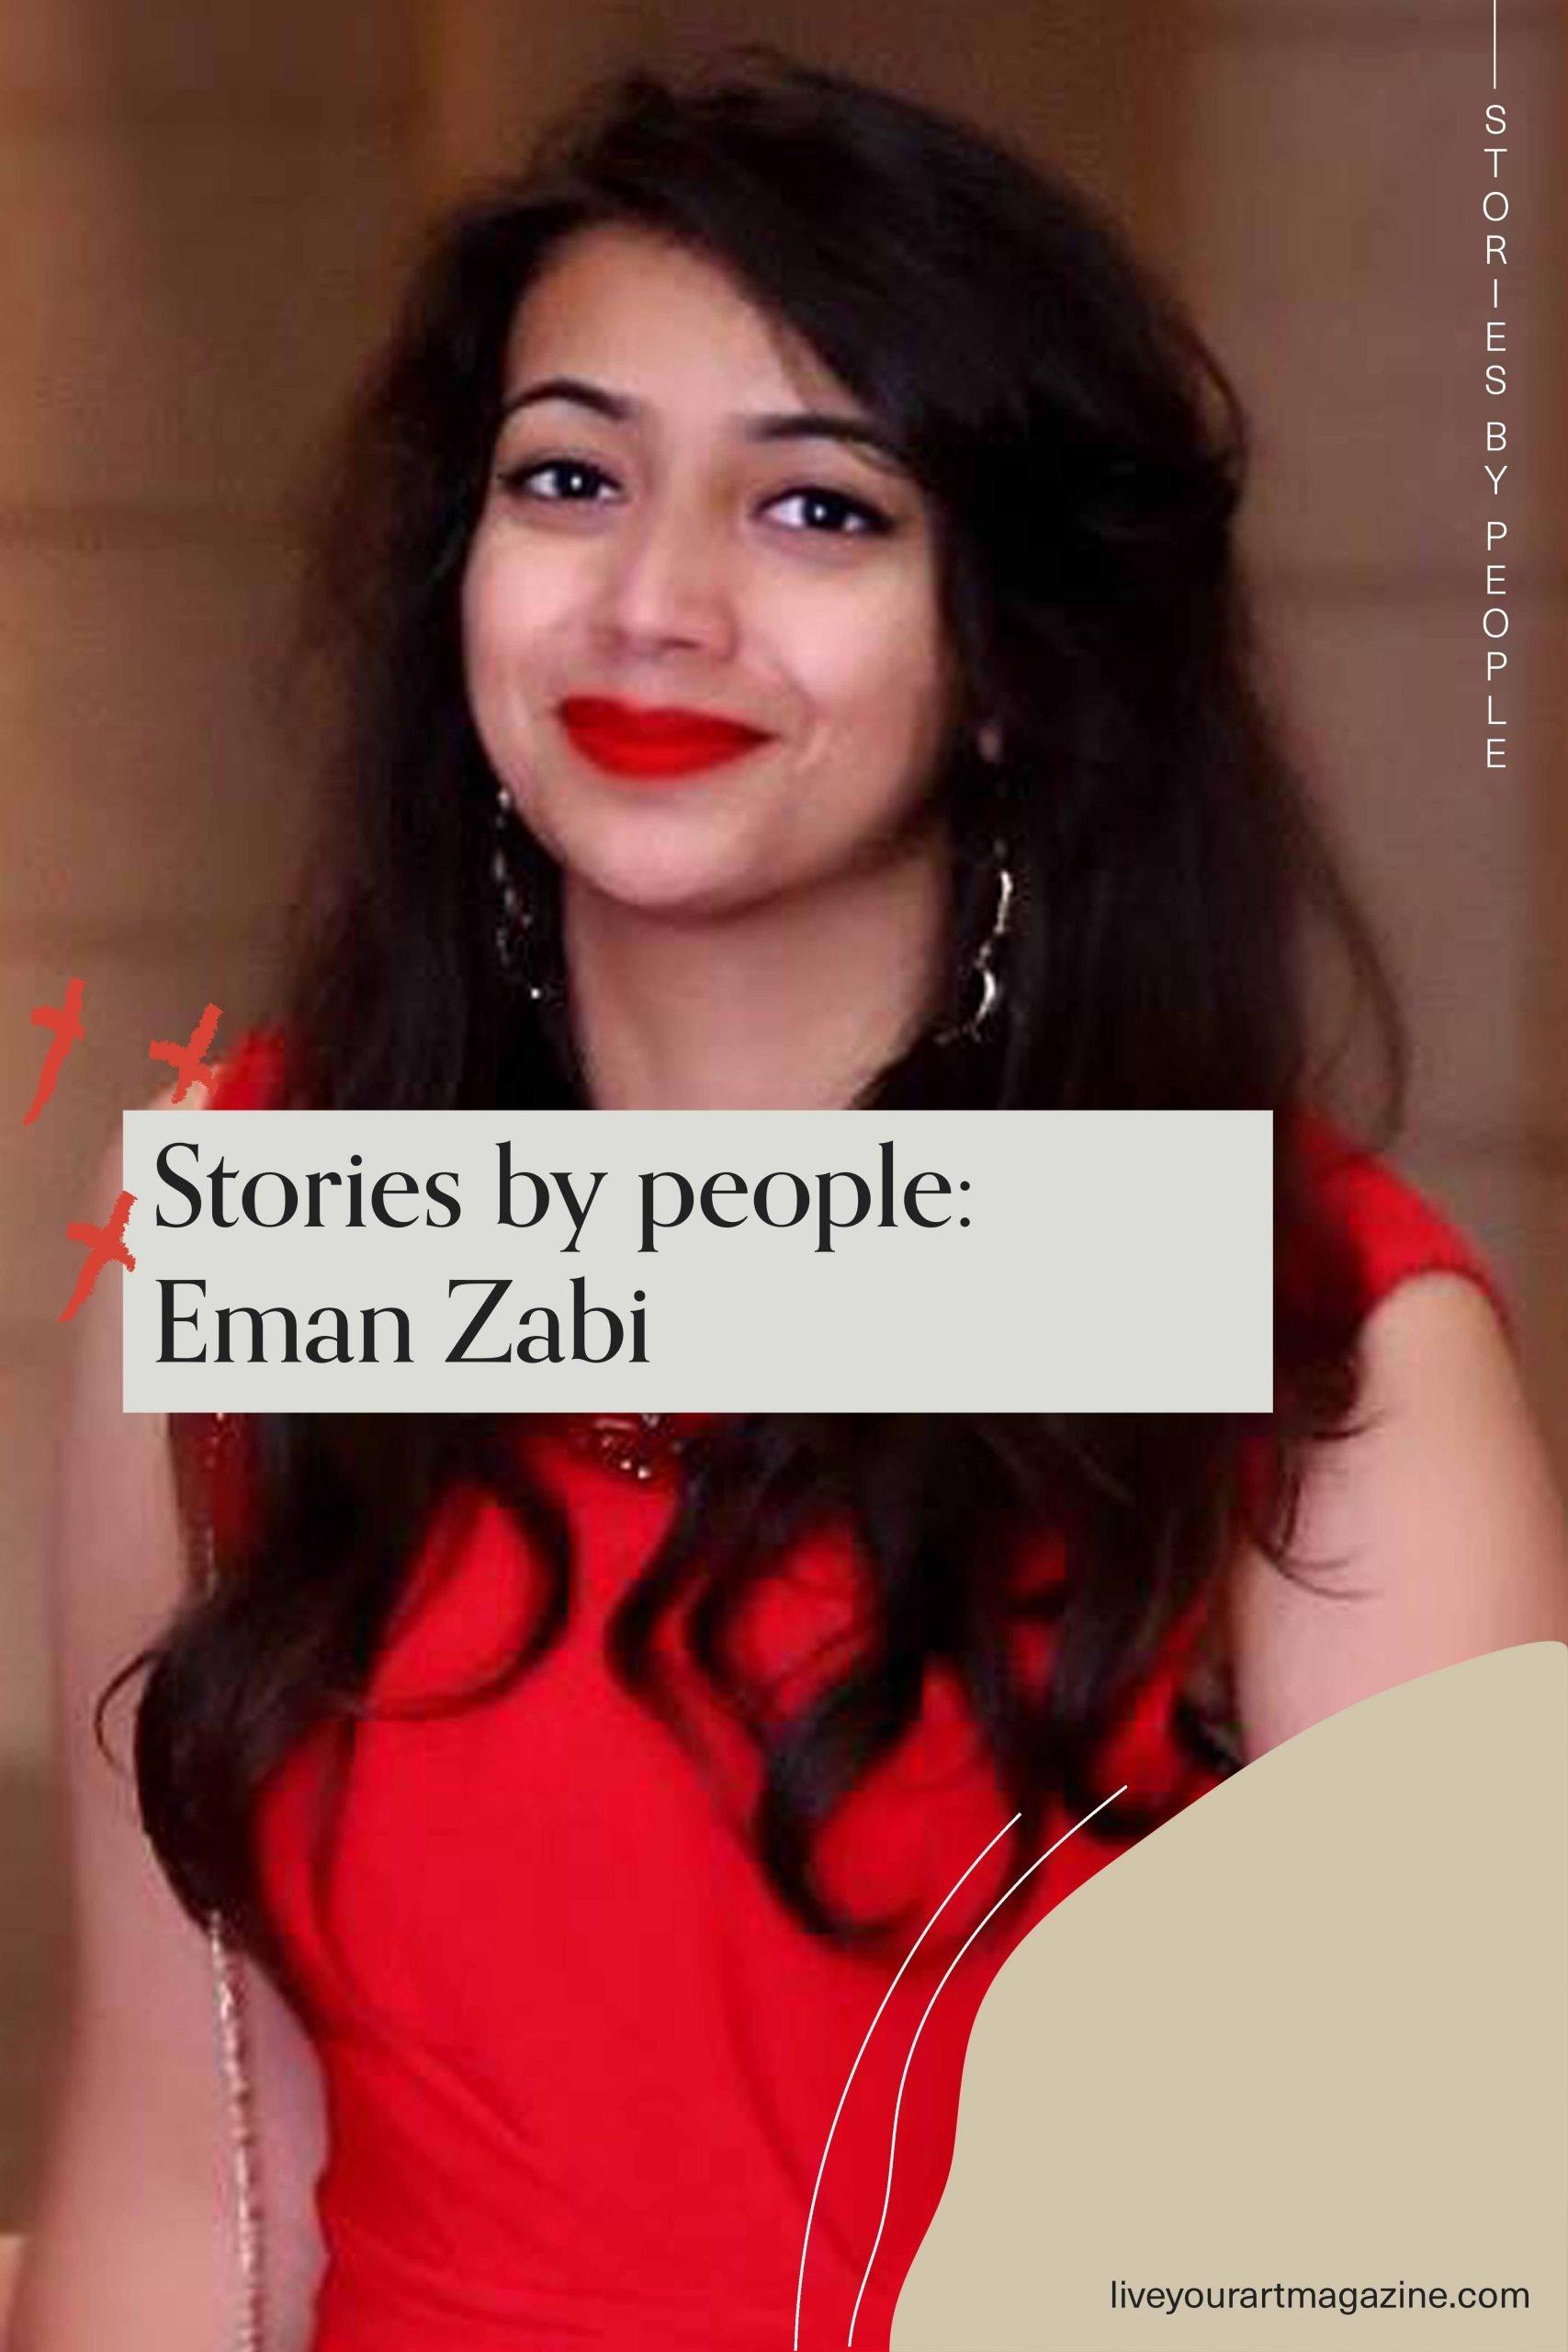 Stories by people: Eman Zabi